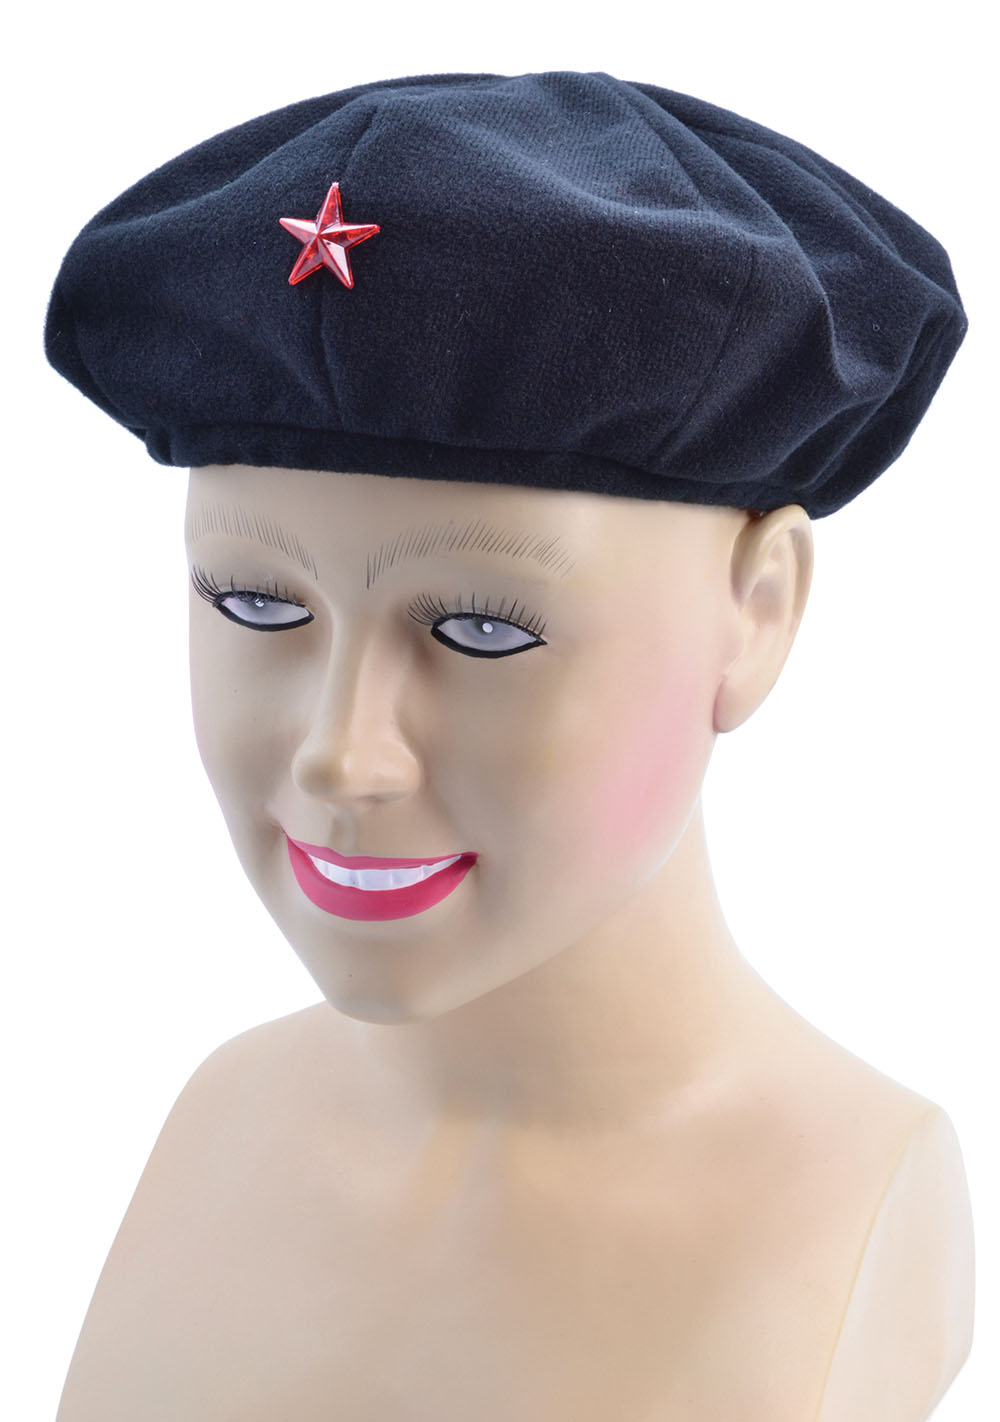 Sentinel Che Guevara Cuban Revolutionist Beret Hat Guerrilla Citizen Smith  Fancy Dress f7c65a299ff